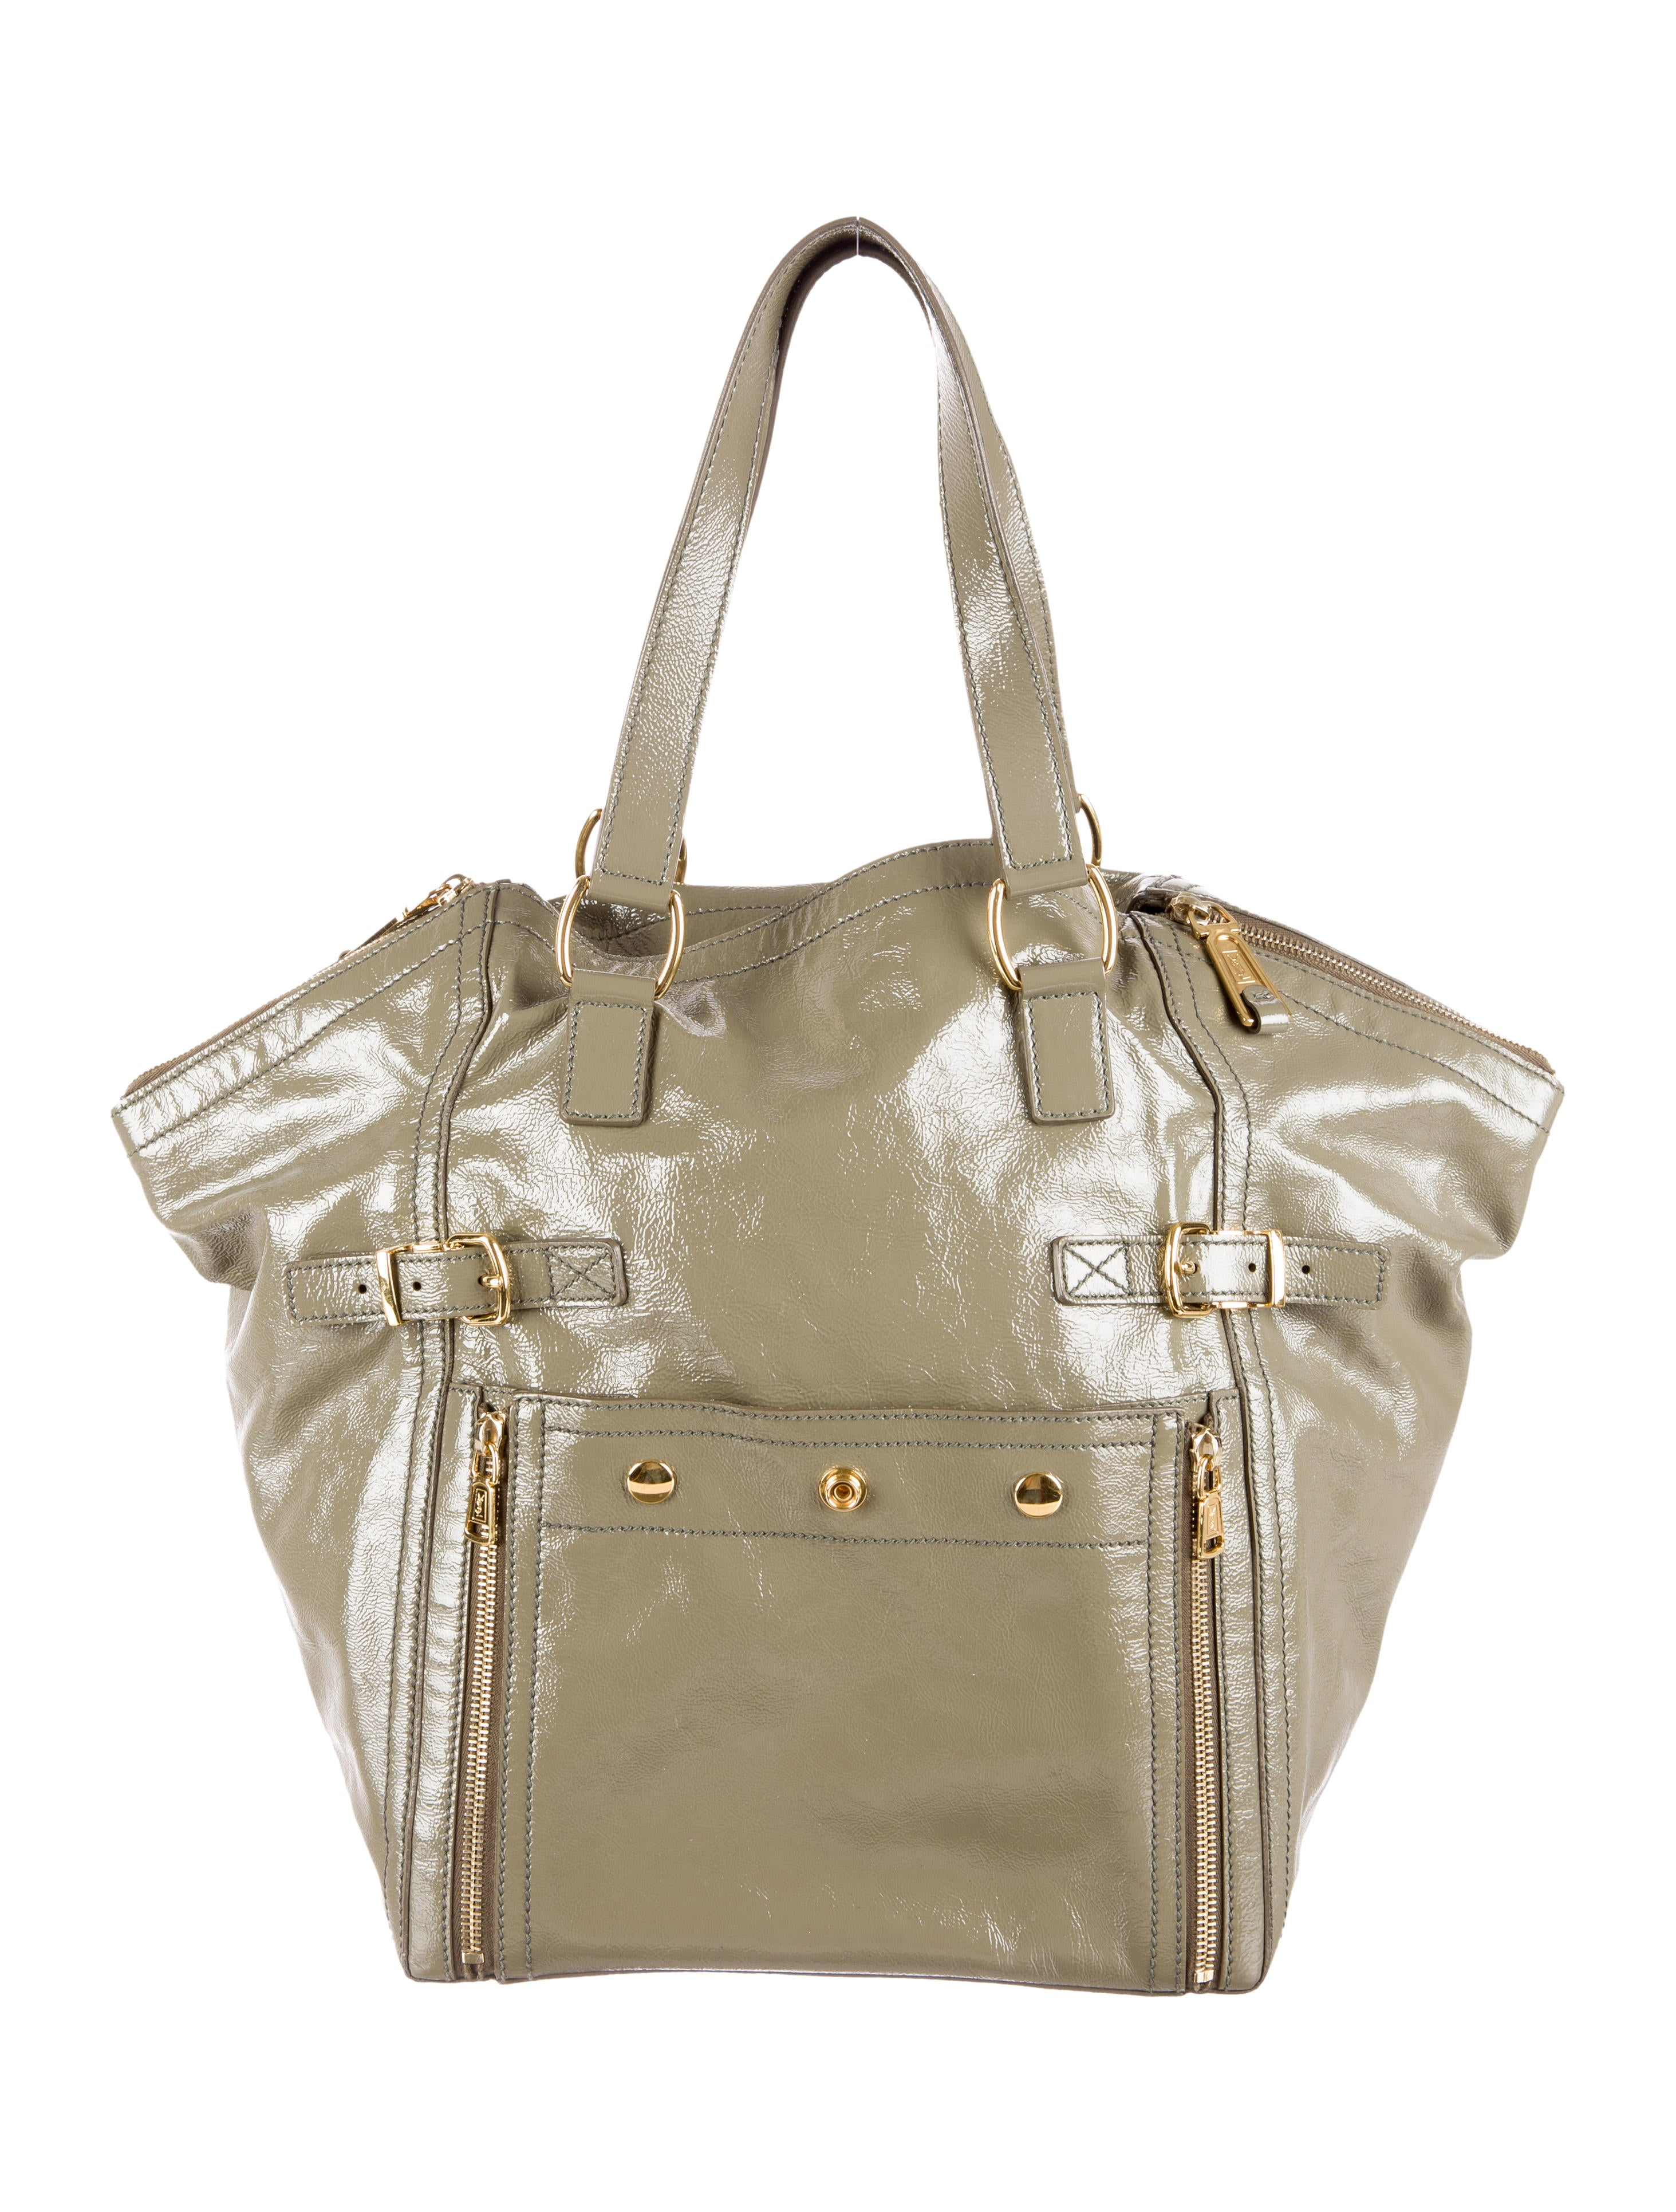 Yves Saint Laurent Downtown Tote - Handbags - YVE38018 | The RealReal